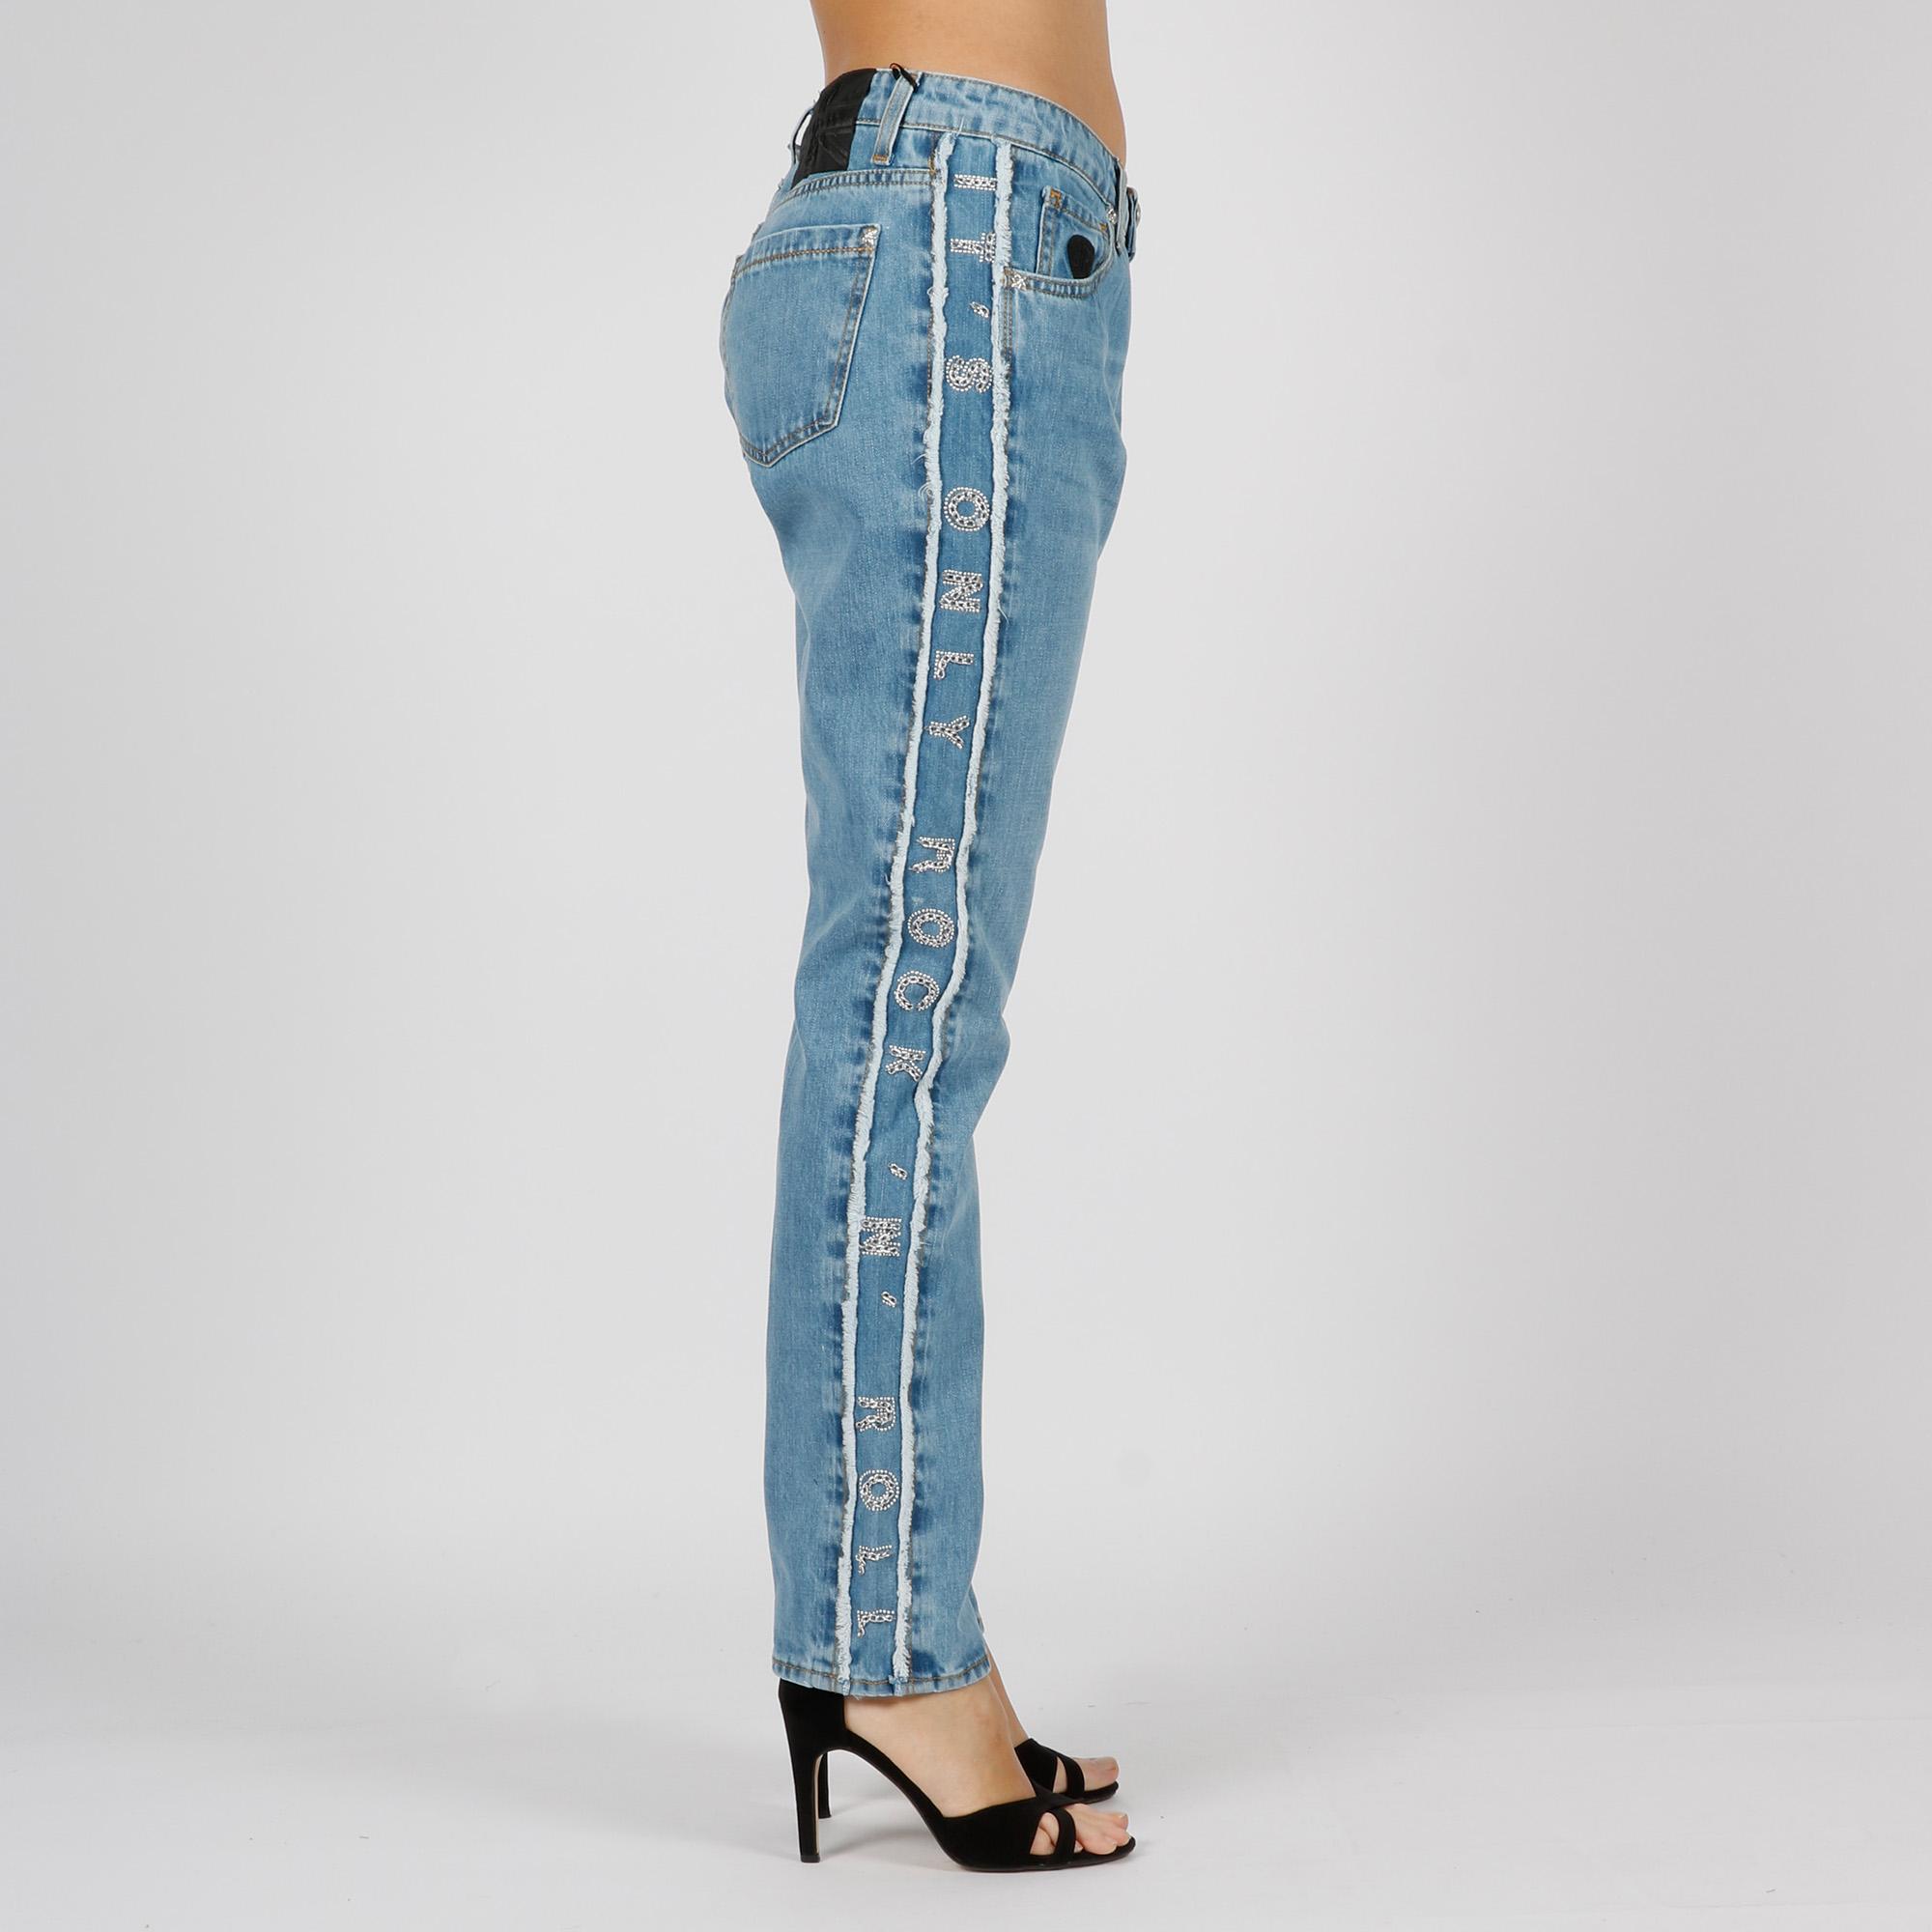 Jeans gallus patty- Denim